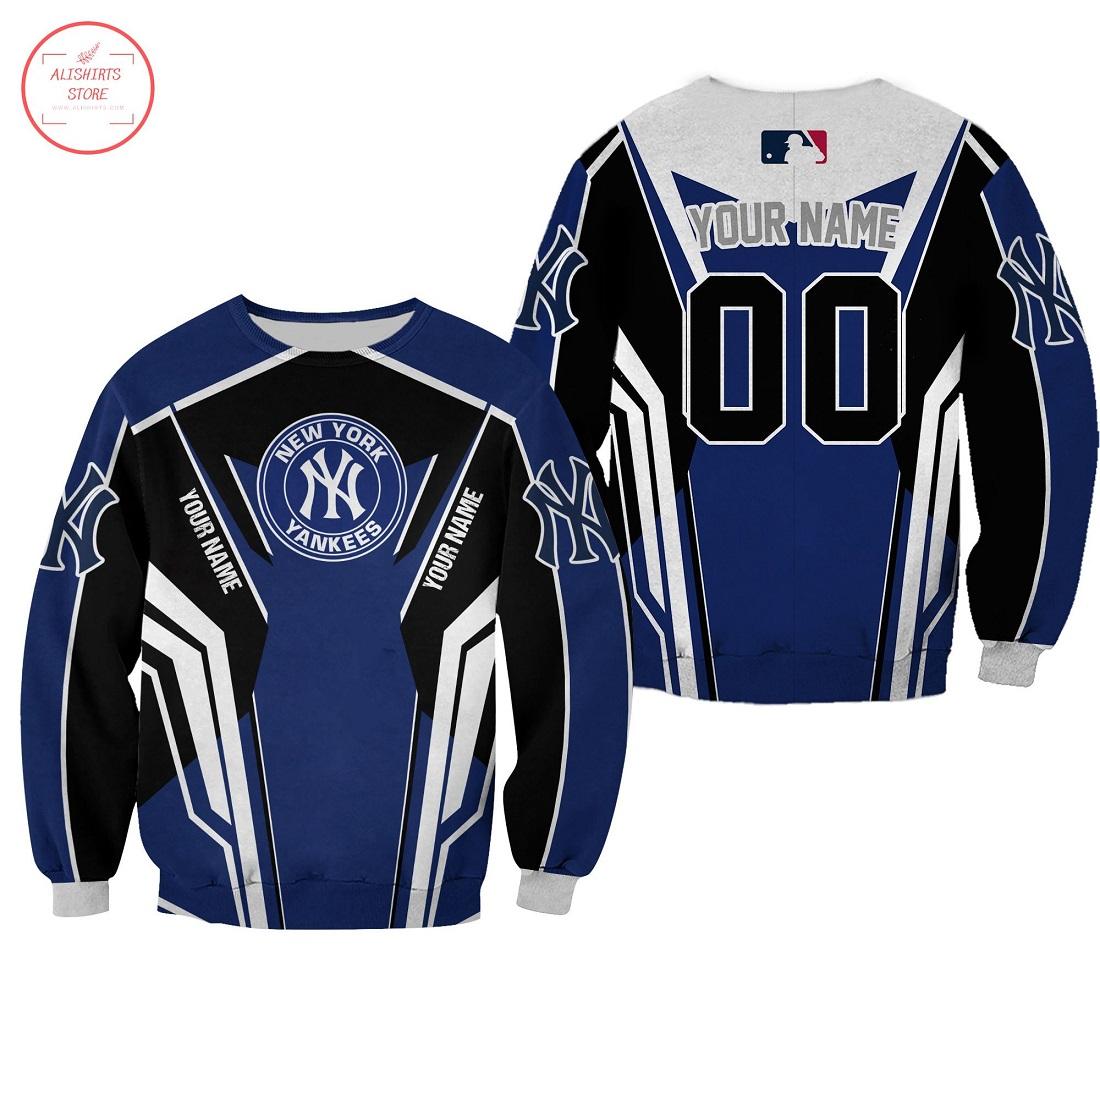 Personalized New York Yankees 3D T-Shirt, Hoodie, Sweatshirt